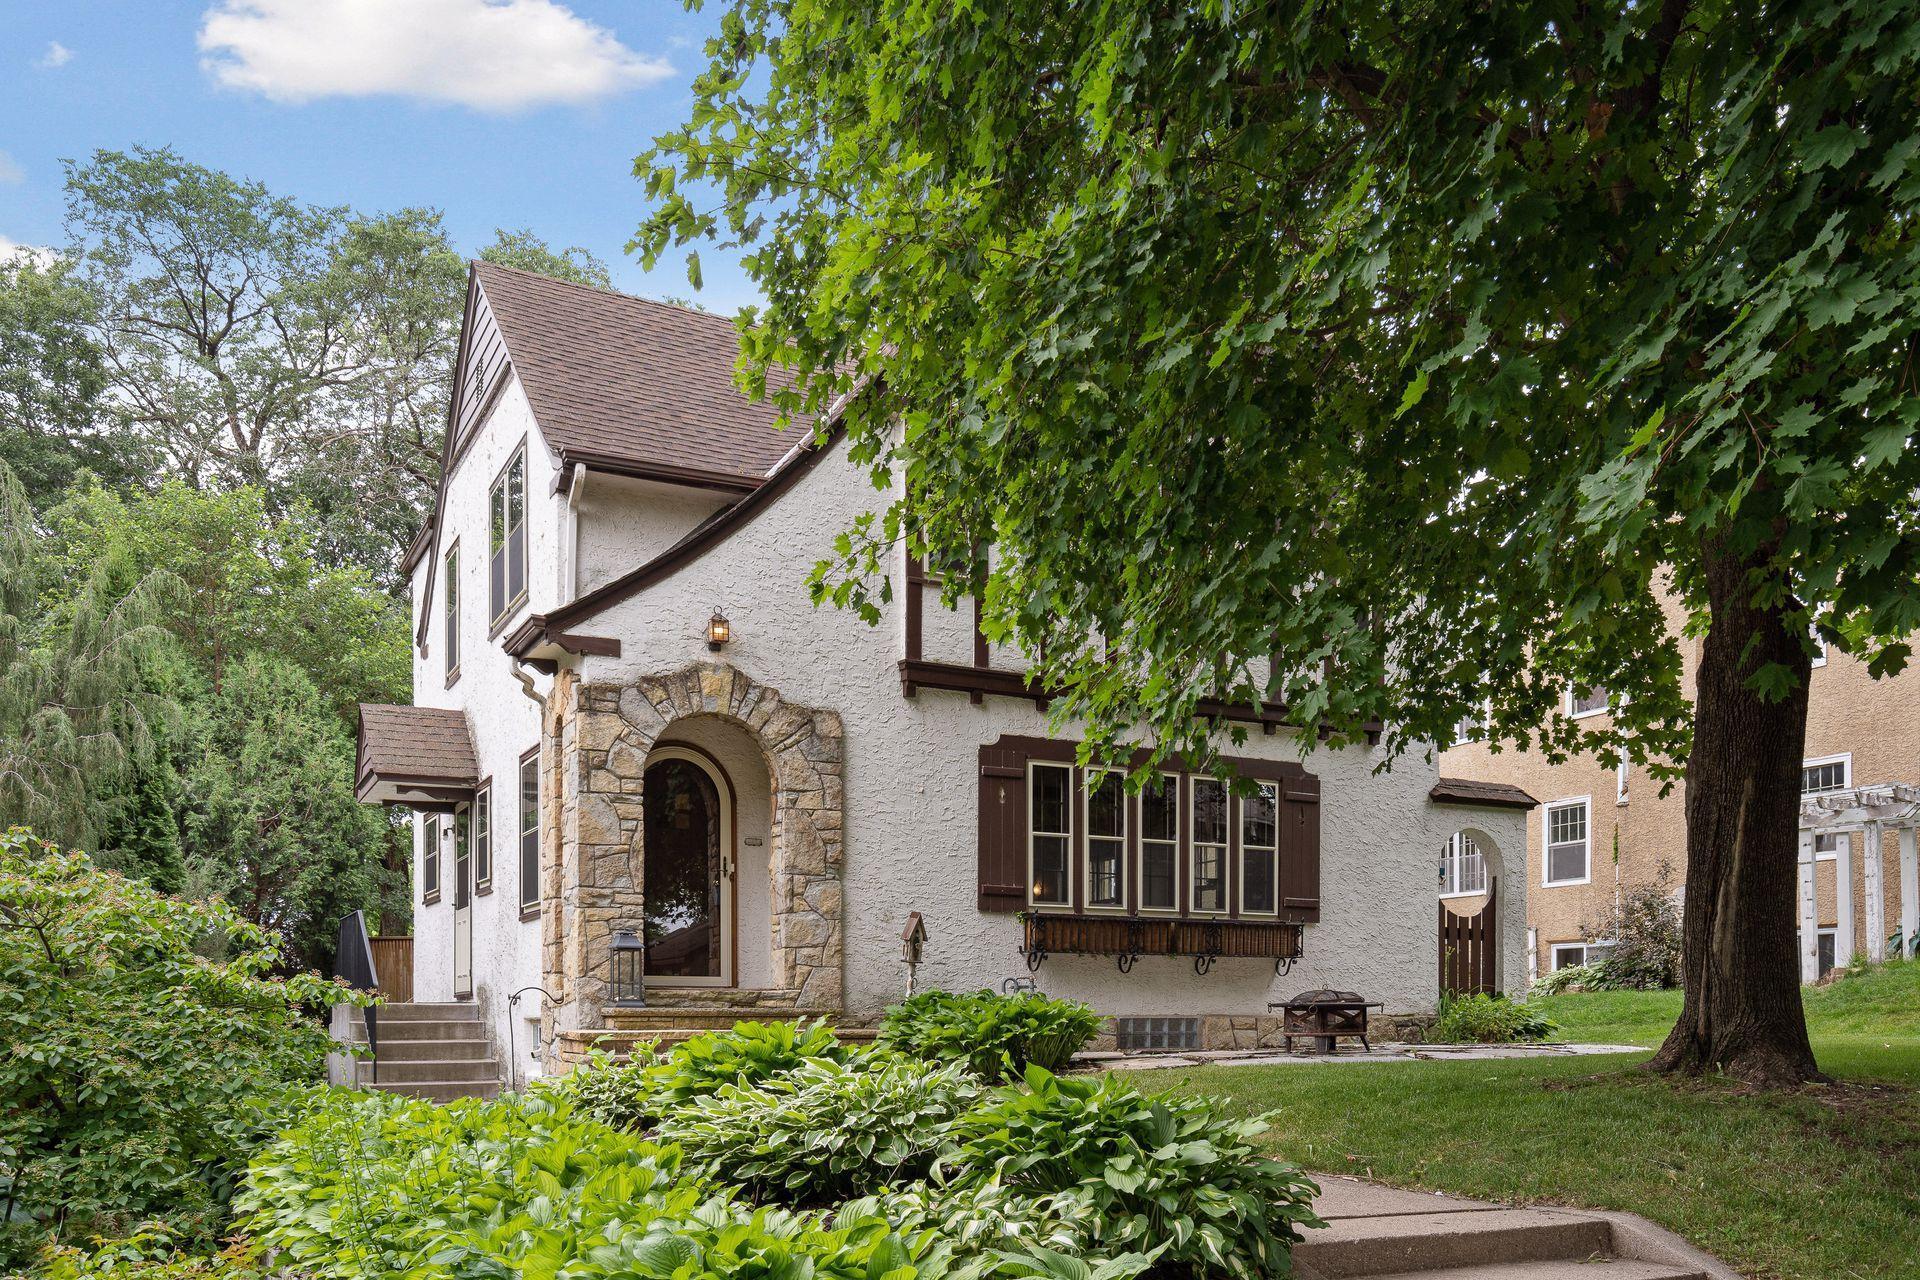 309 Longview Property Photo - Minneapolis, MN real estate listing